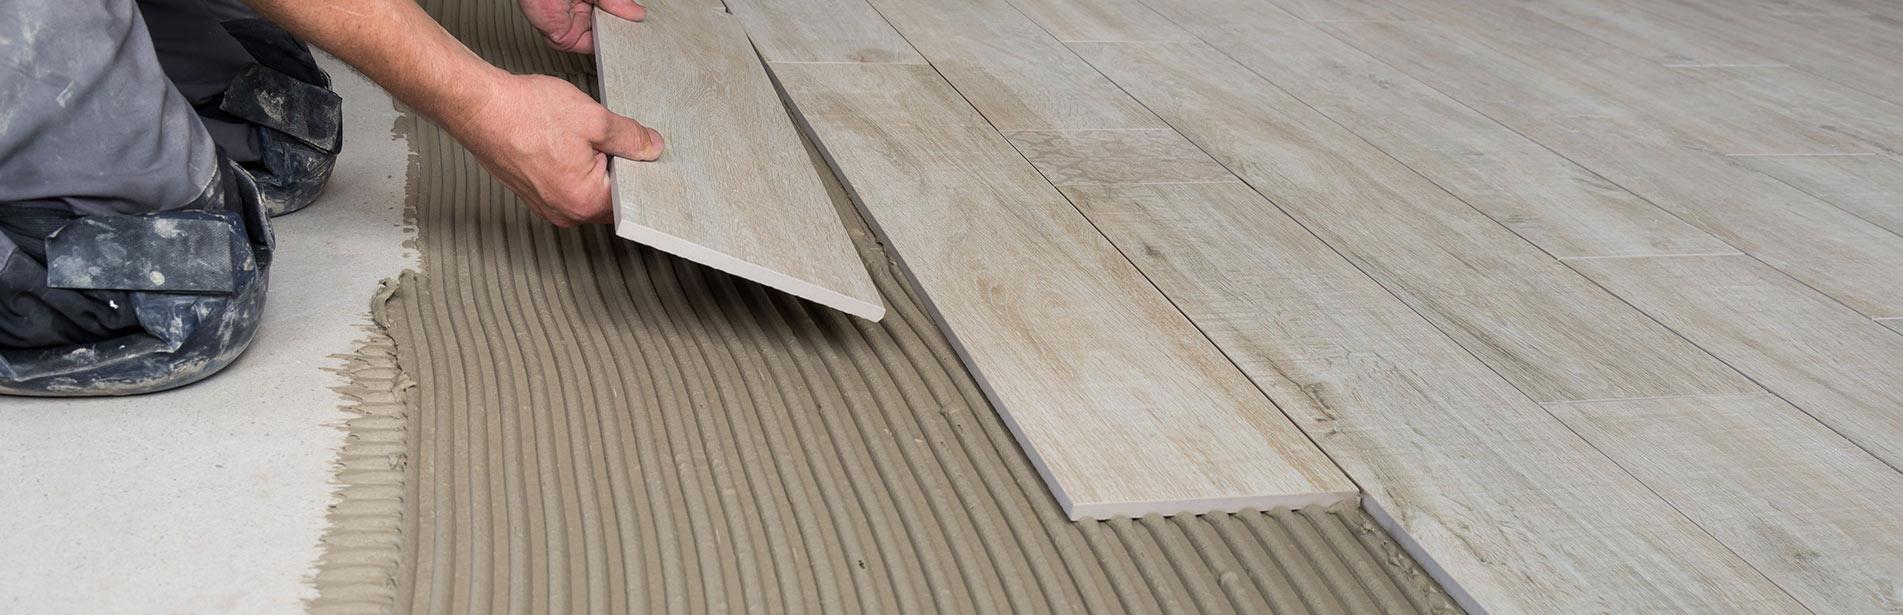 Tile Contractor in Phoenix, AZ | Tile Installation Service